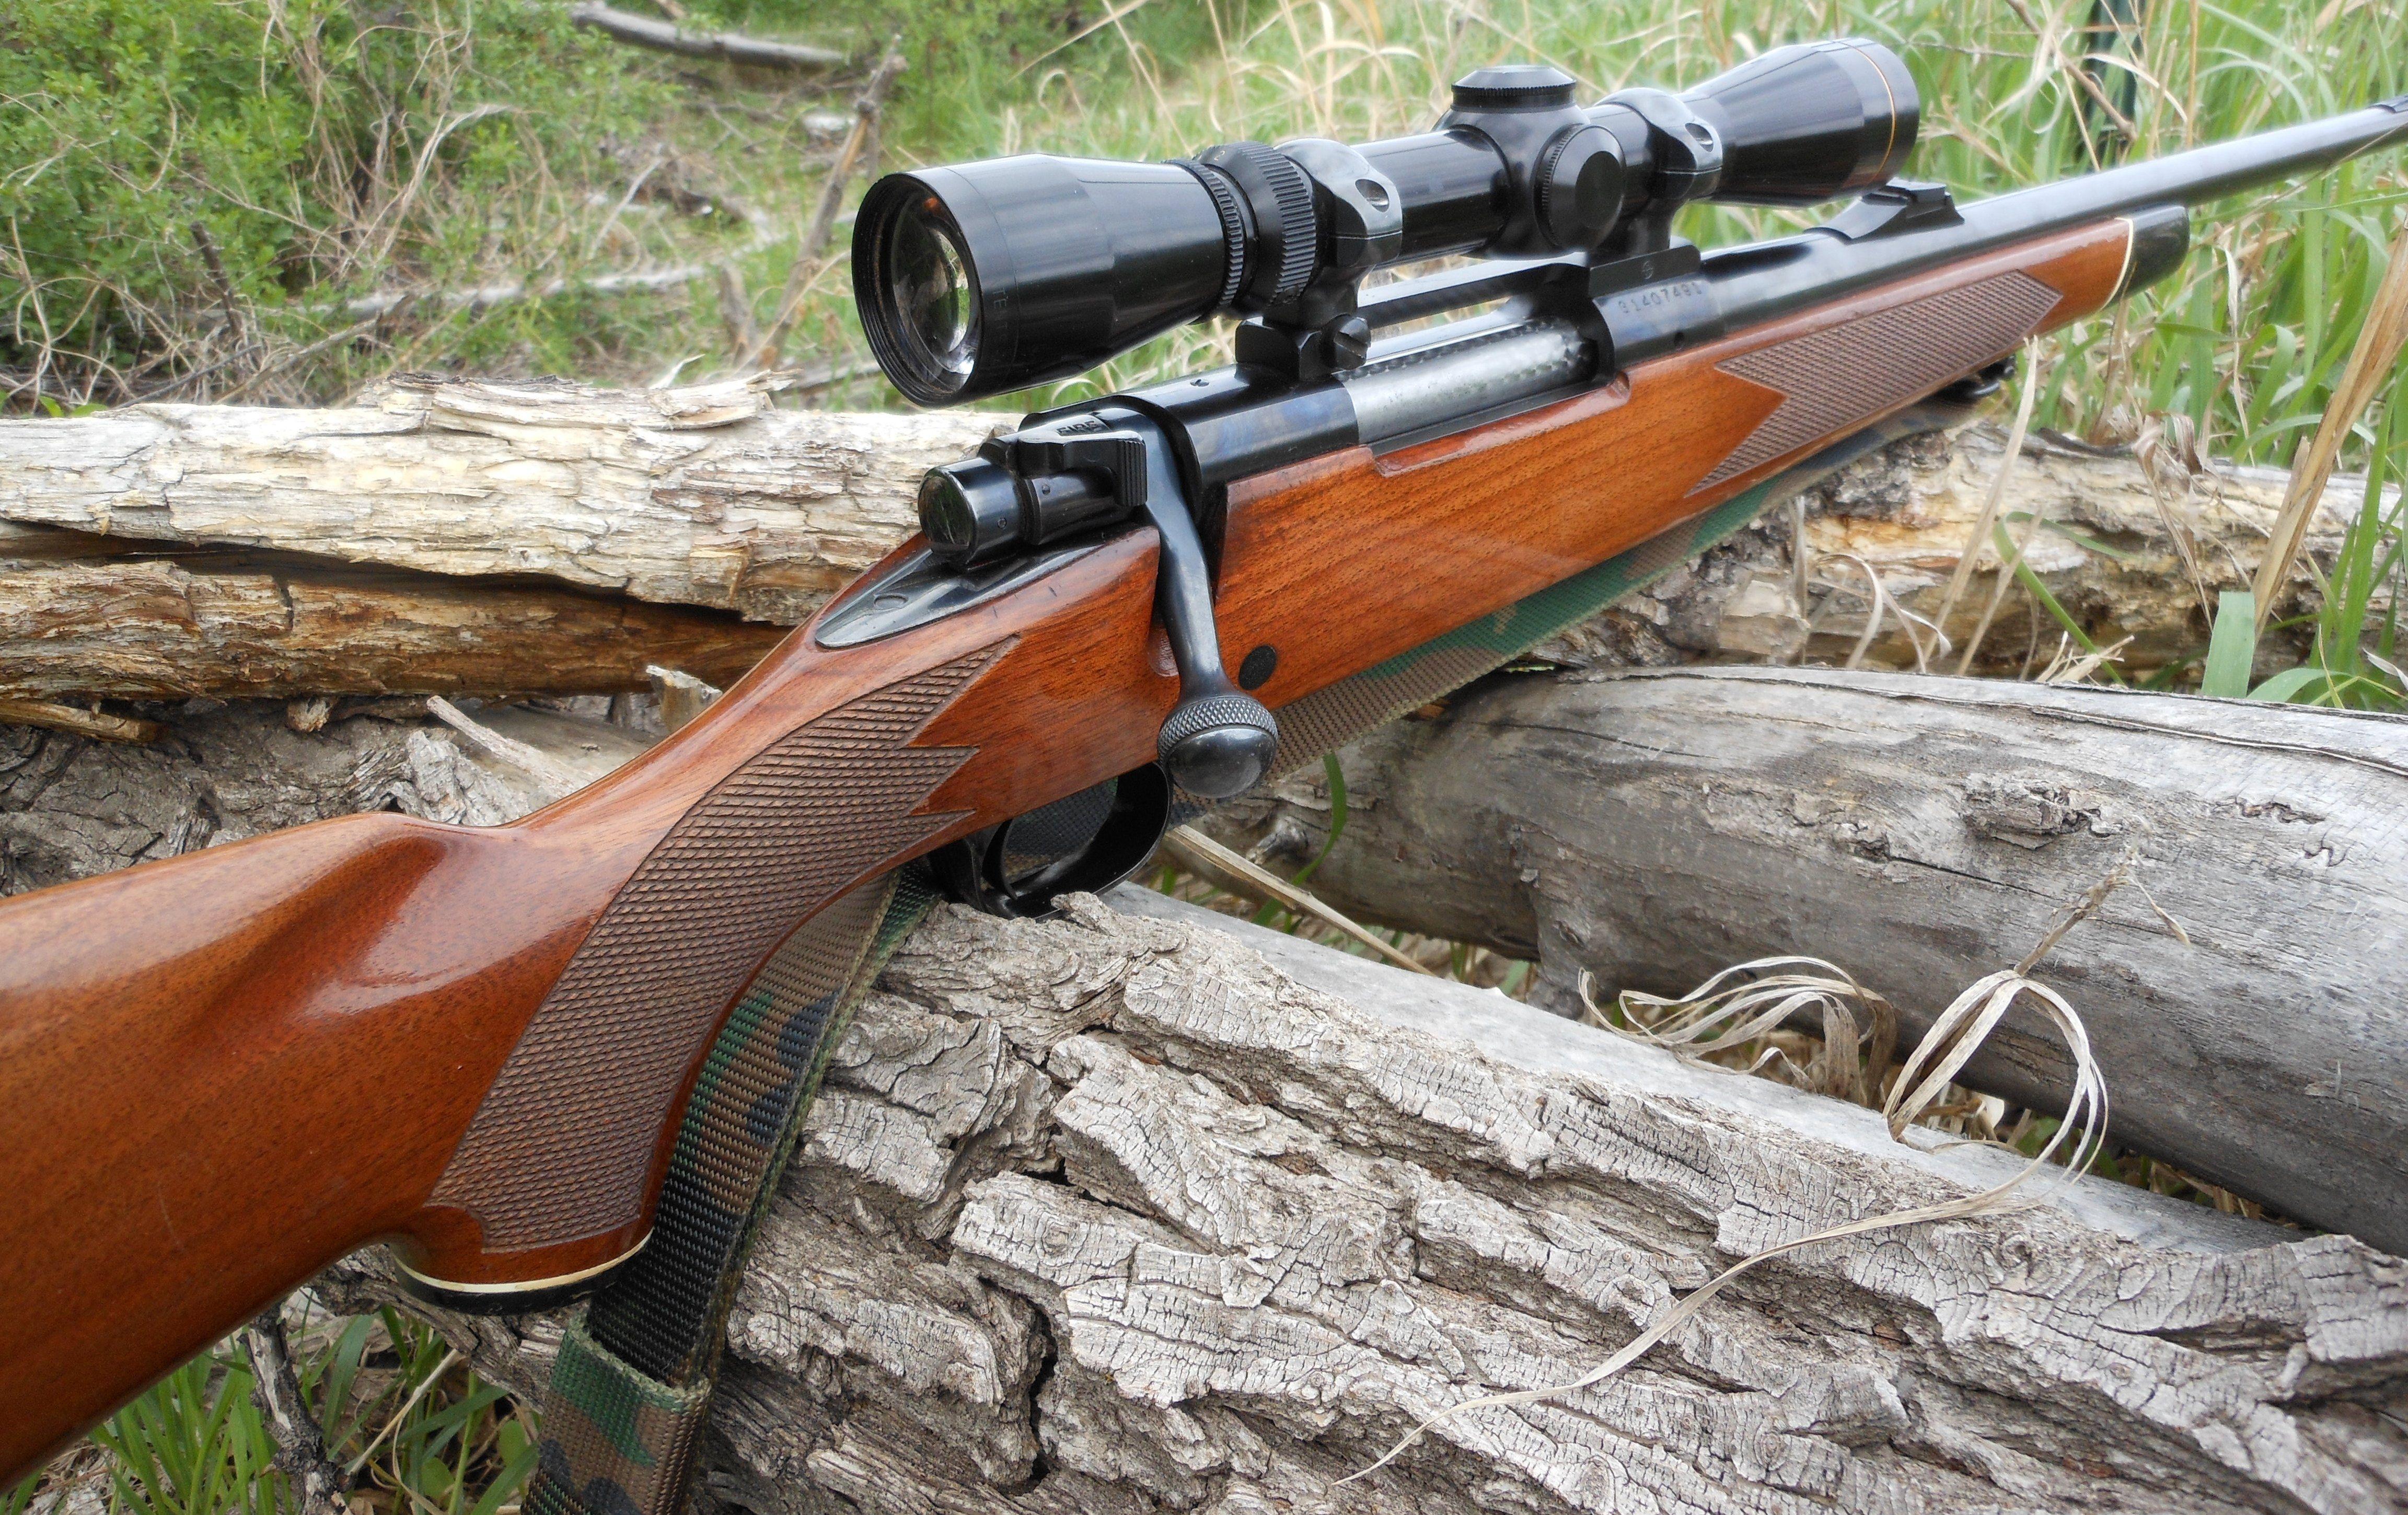 Lovačko oružje i municija - Page 3 3fddc8f2e9ff35dc038ec188445930e5